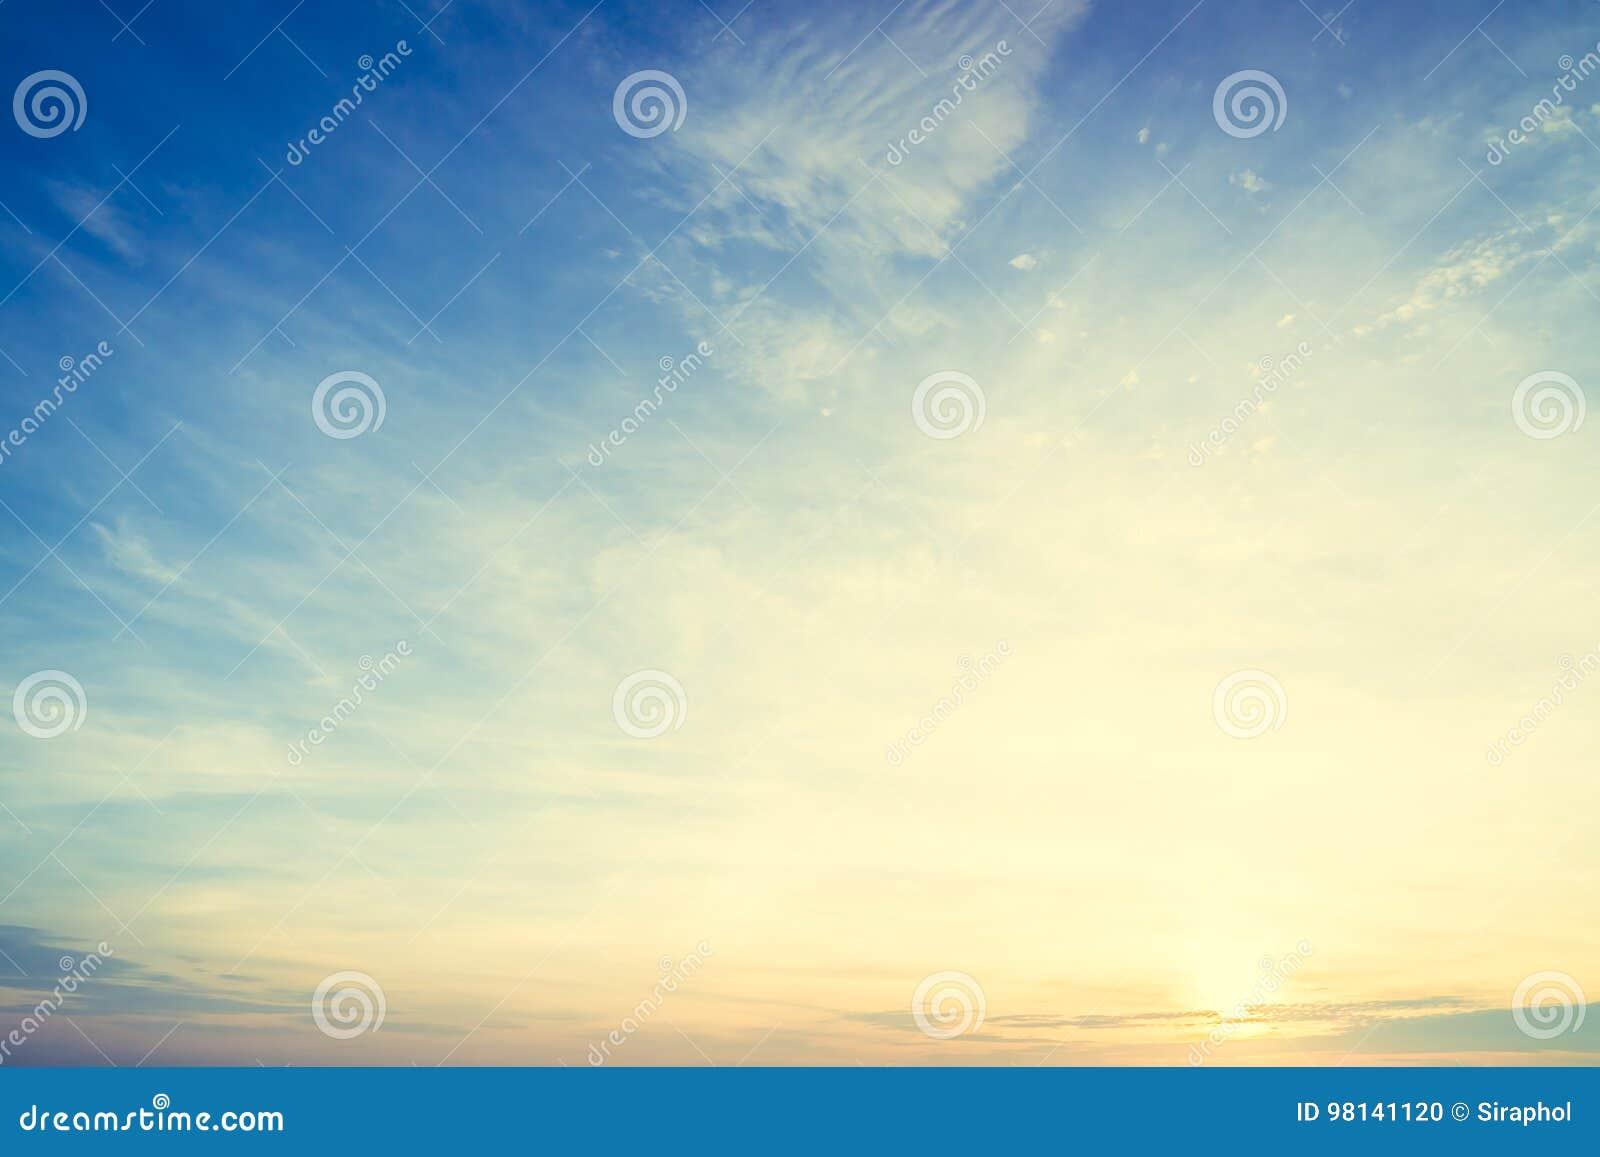 Sunrise and sky